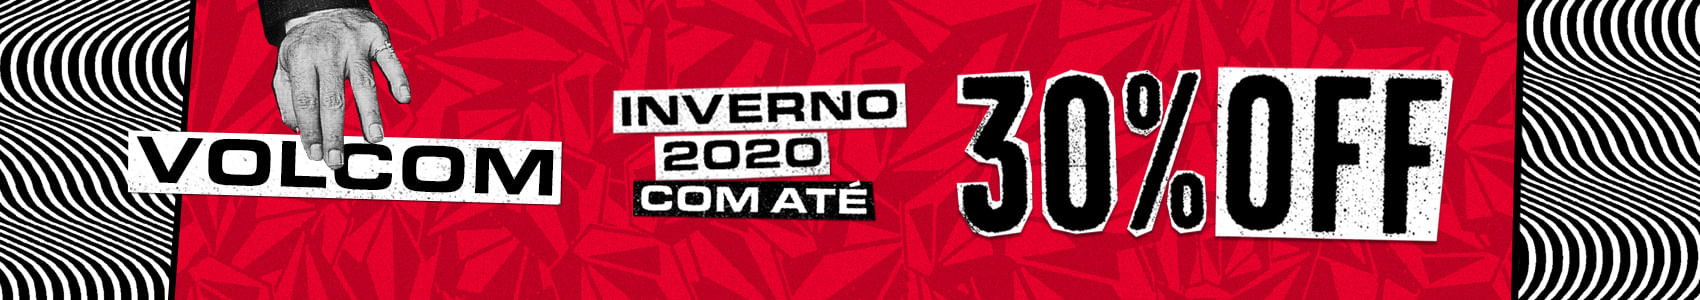 Banner Sale Inverno 2020